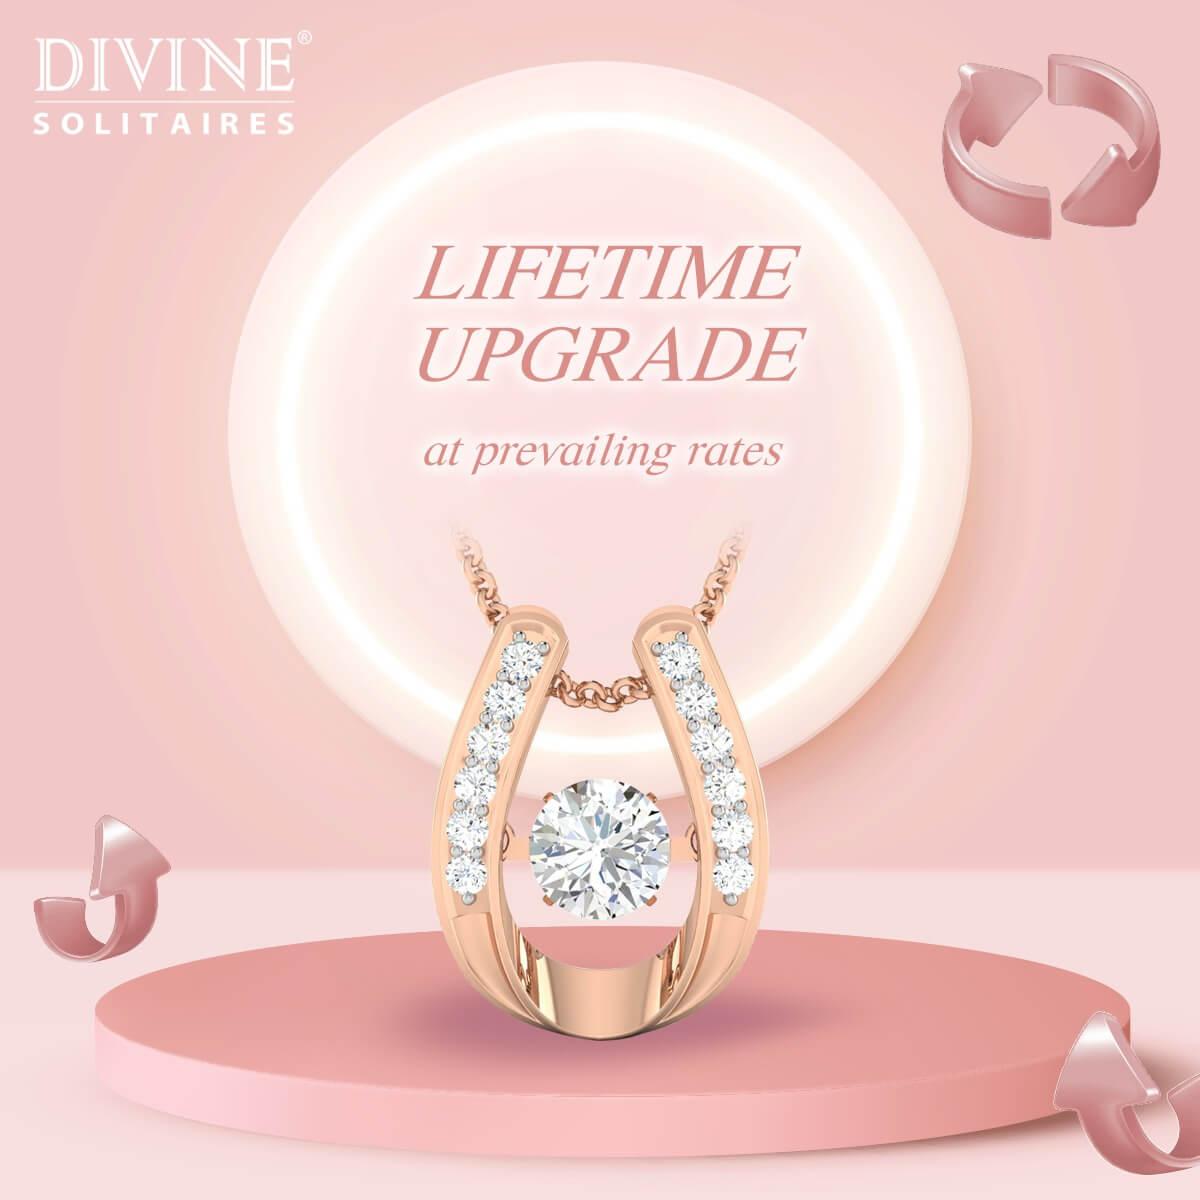 @divinesolitaires